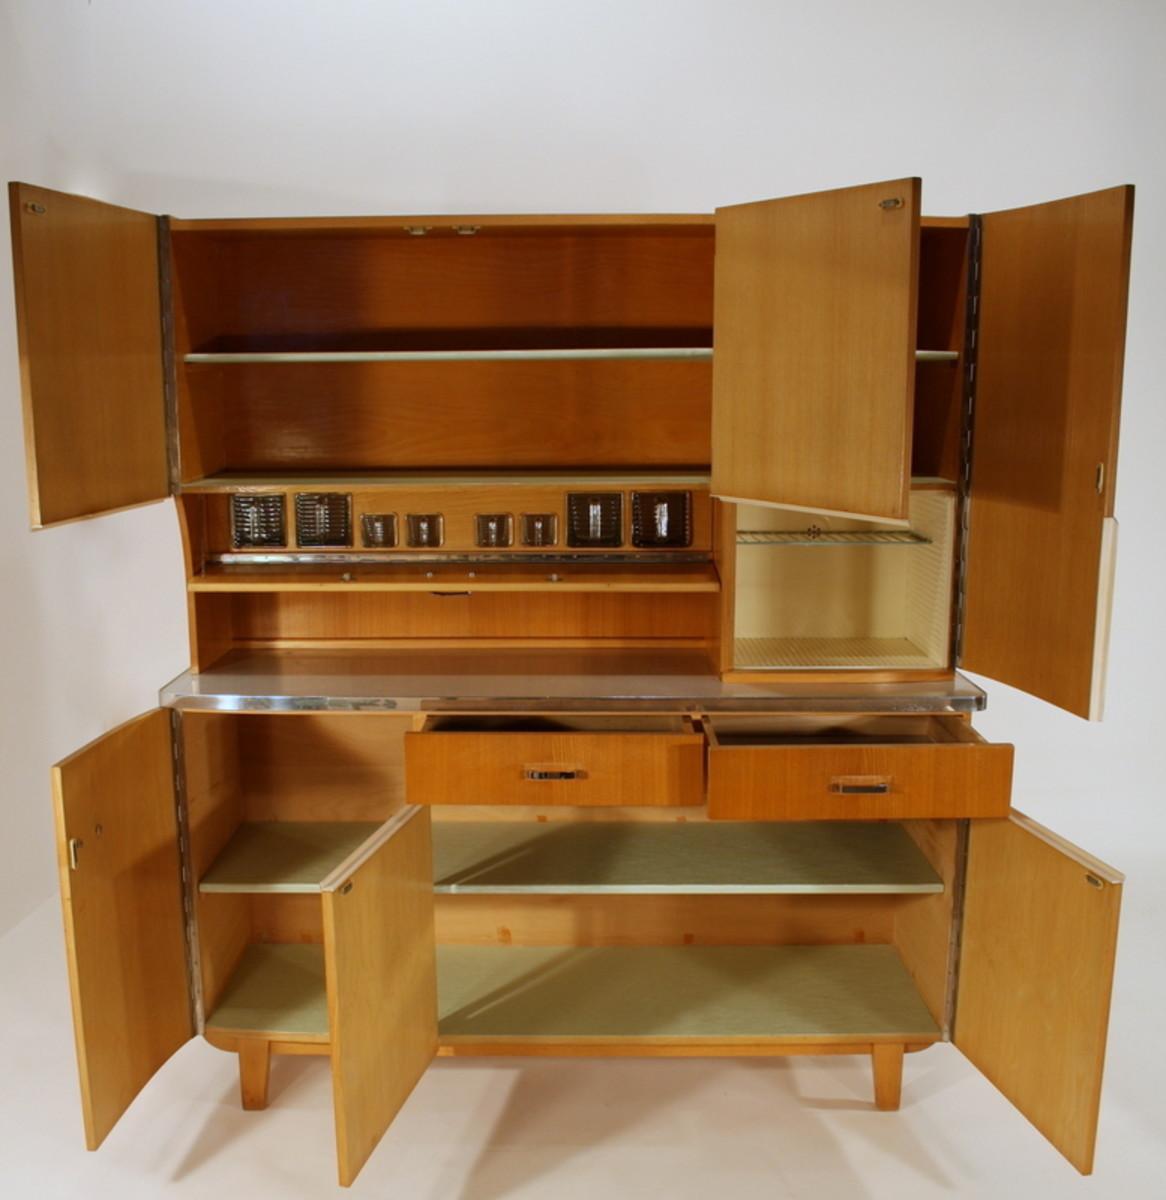 Vintage 1950s wood cabinetry on ebay for $1450.